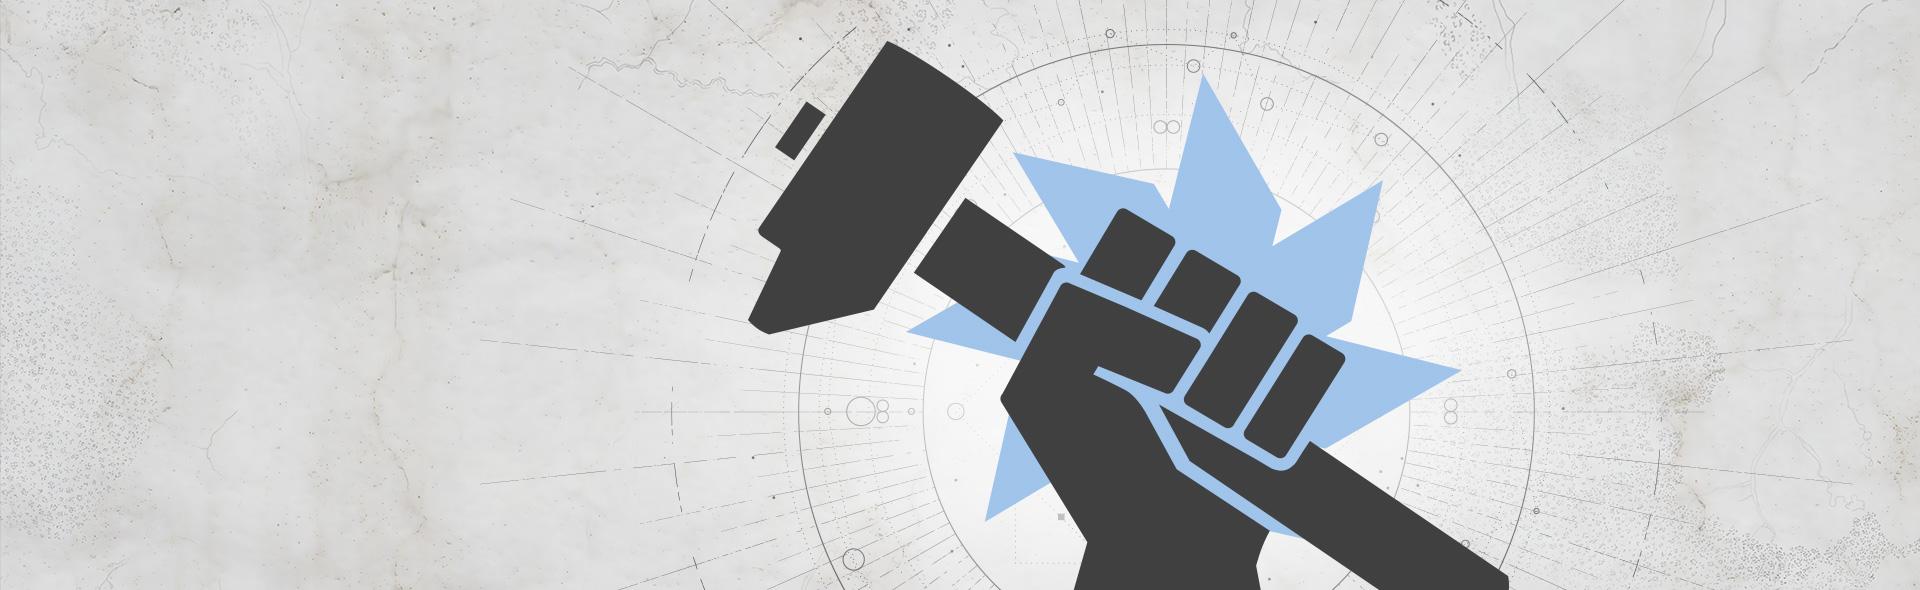 《天命2》更新檔2.7.1版